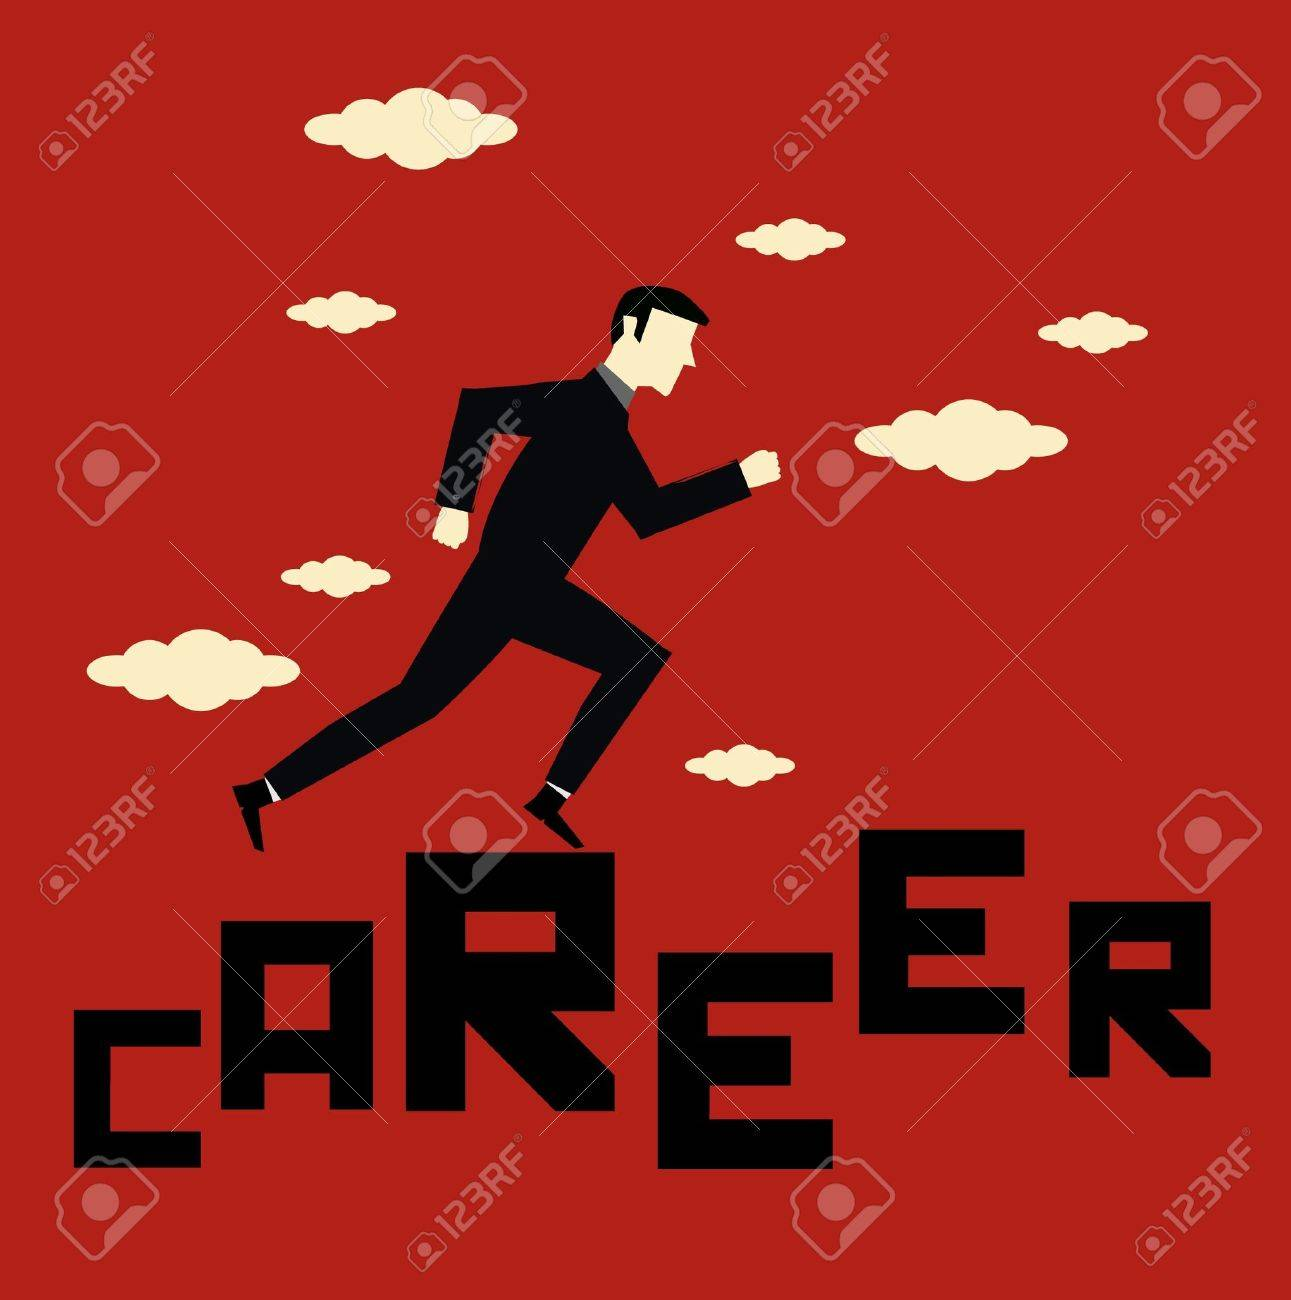 Businessman Career Stock Vector - 13792048